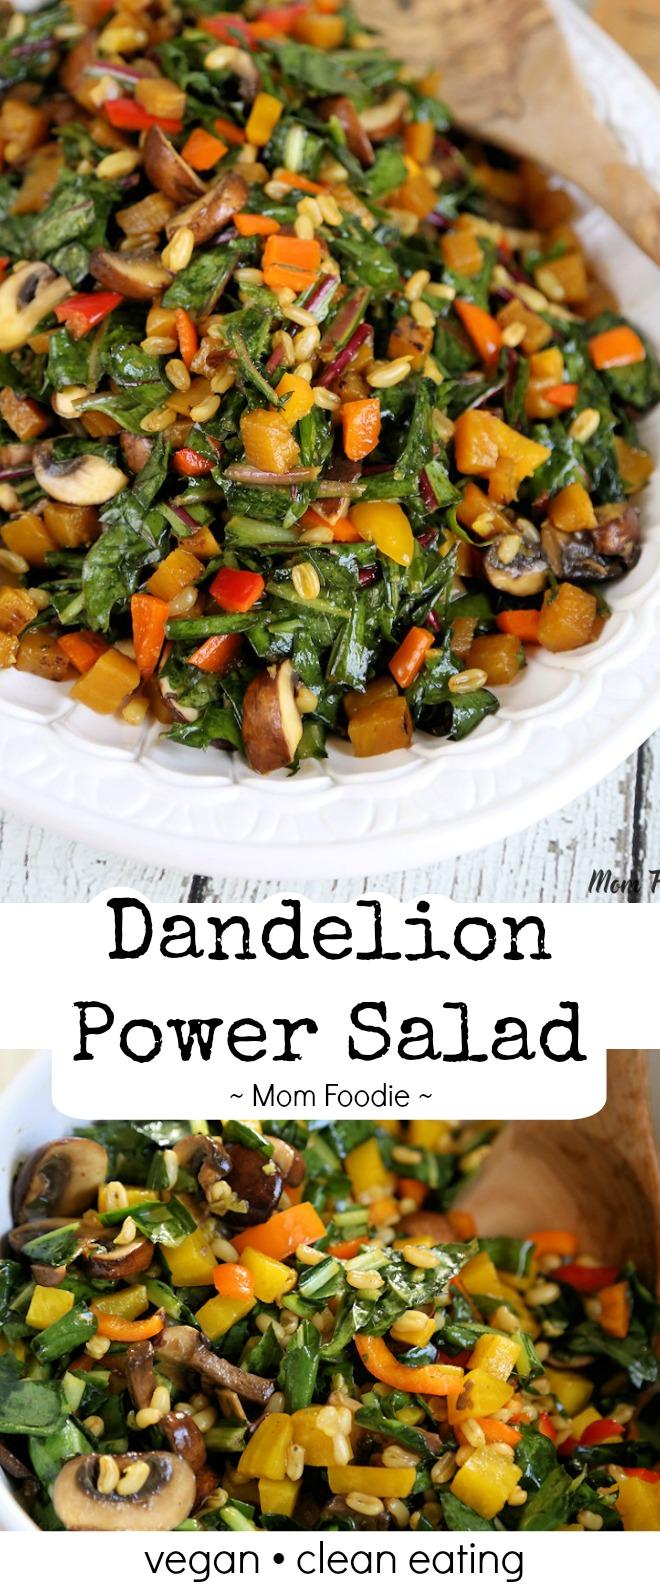 Dandelion Greens salad recipe with golden beets, kamut, mushrooms & sweet peppers - easy dandelion salad dressing